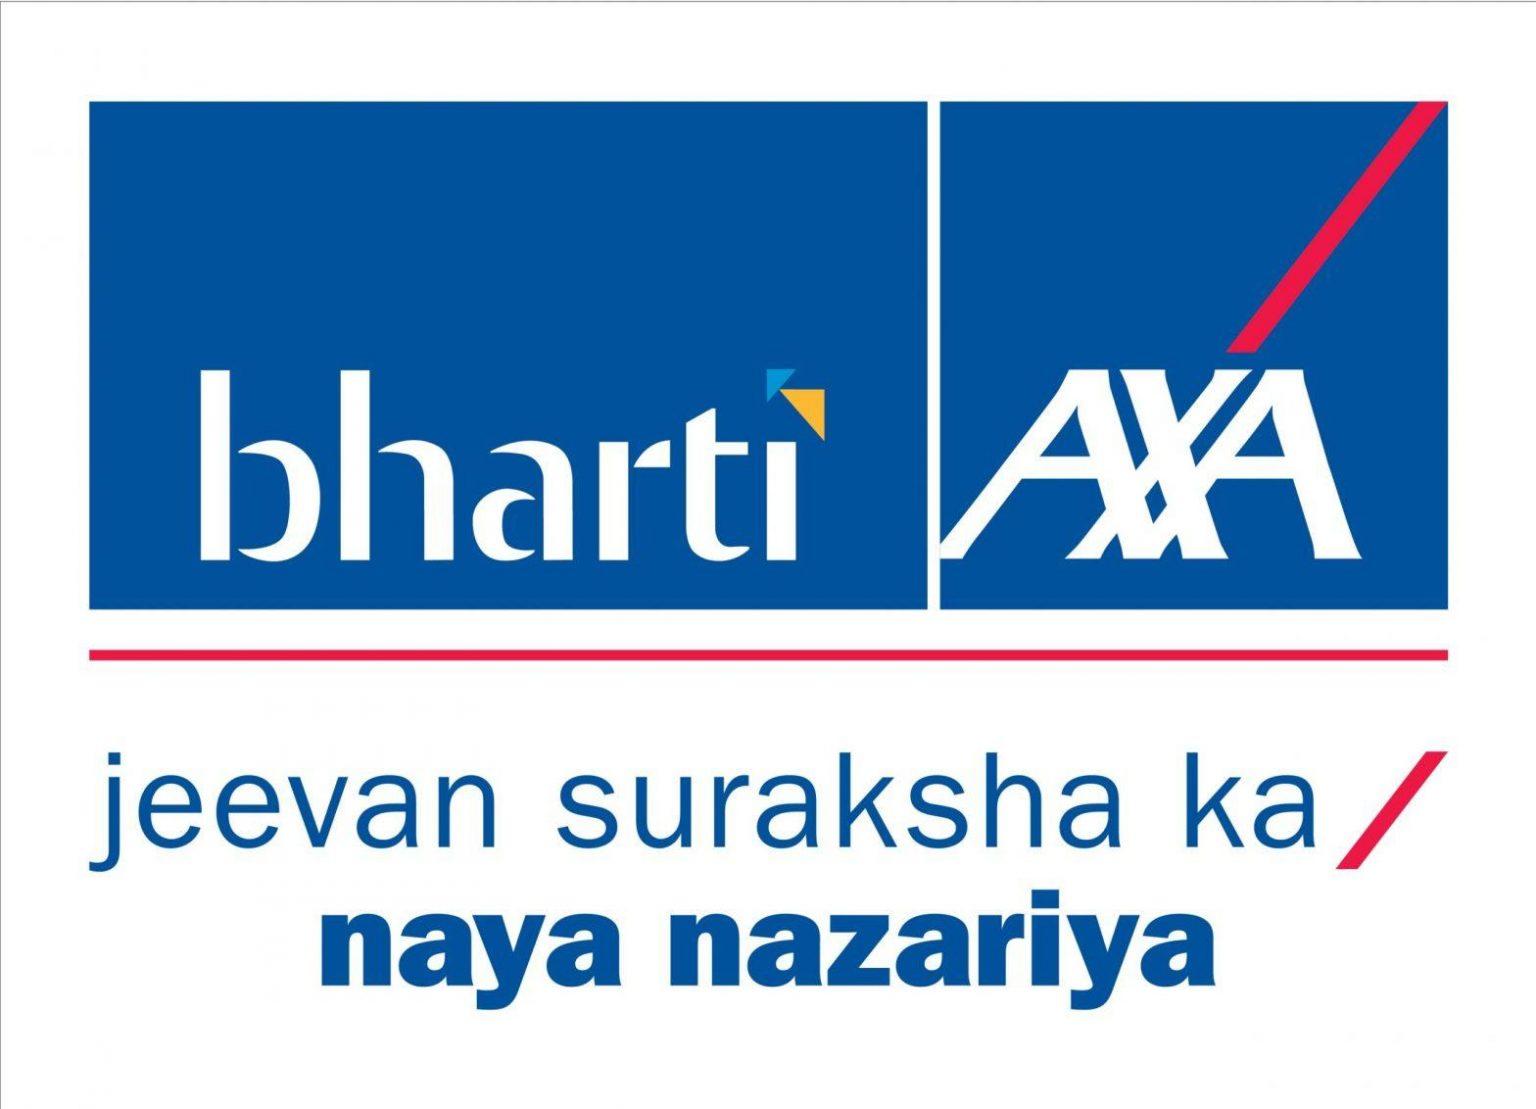 Bharti AXA Life in bancassurance pact with Shivalik Small Finance Bank   శివాలిక్ స్మాల్ ఫైనాన్స్ బ్యాంక్తో ఒప్పందం కుదుర్చుకున్న భారతి AXA లైఫ్ ఇన్సూరెన్స్  _40.1